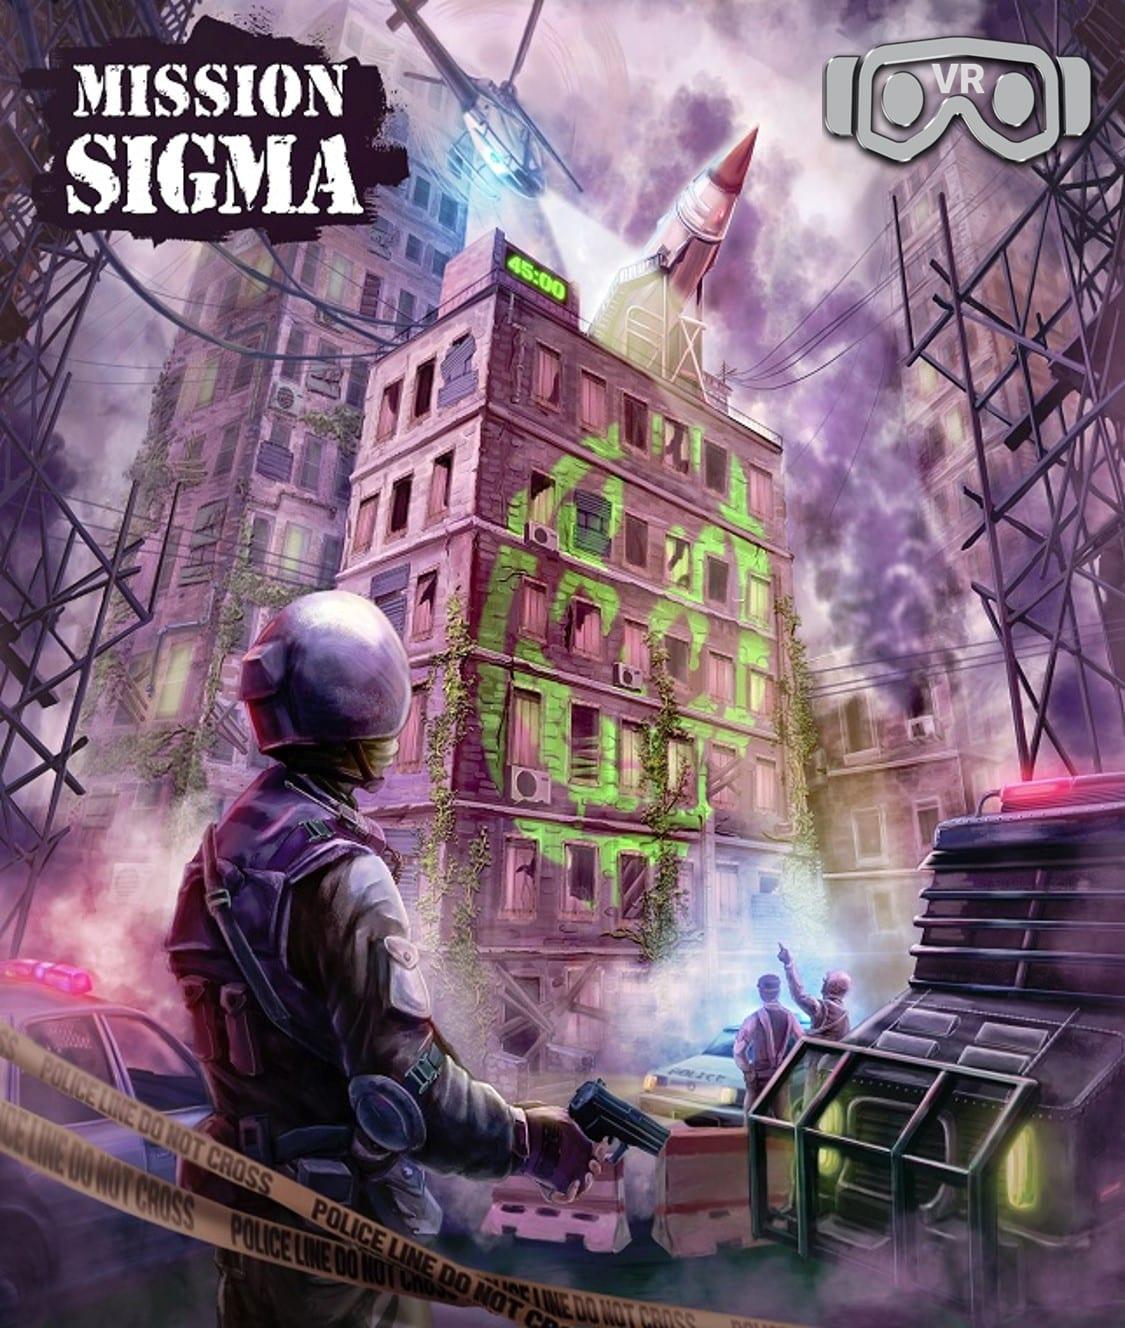 Mission Sigma Entermission Virtual Reality Escape Room x VR